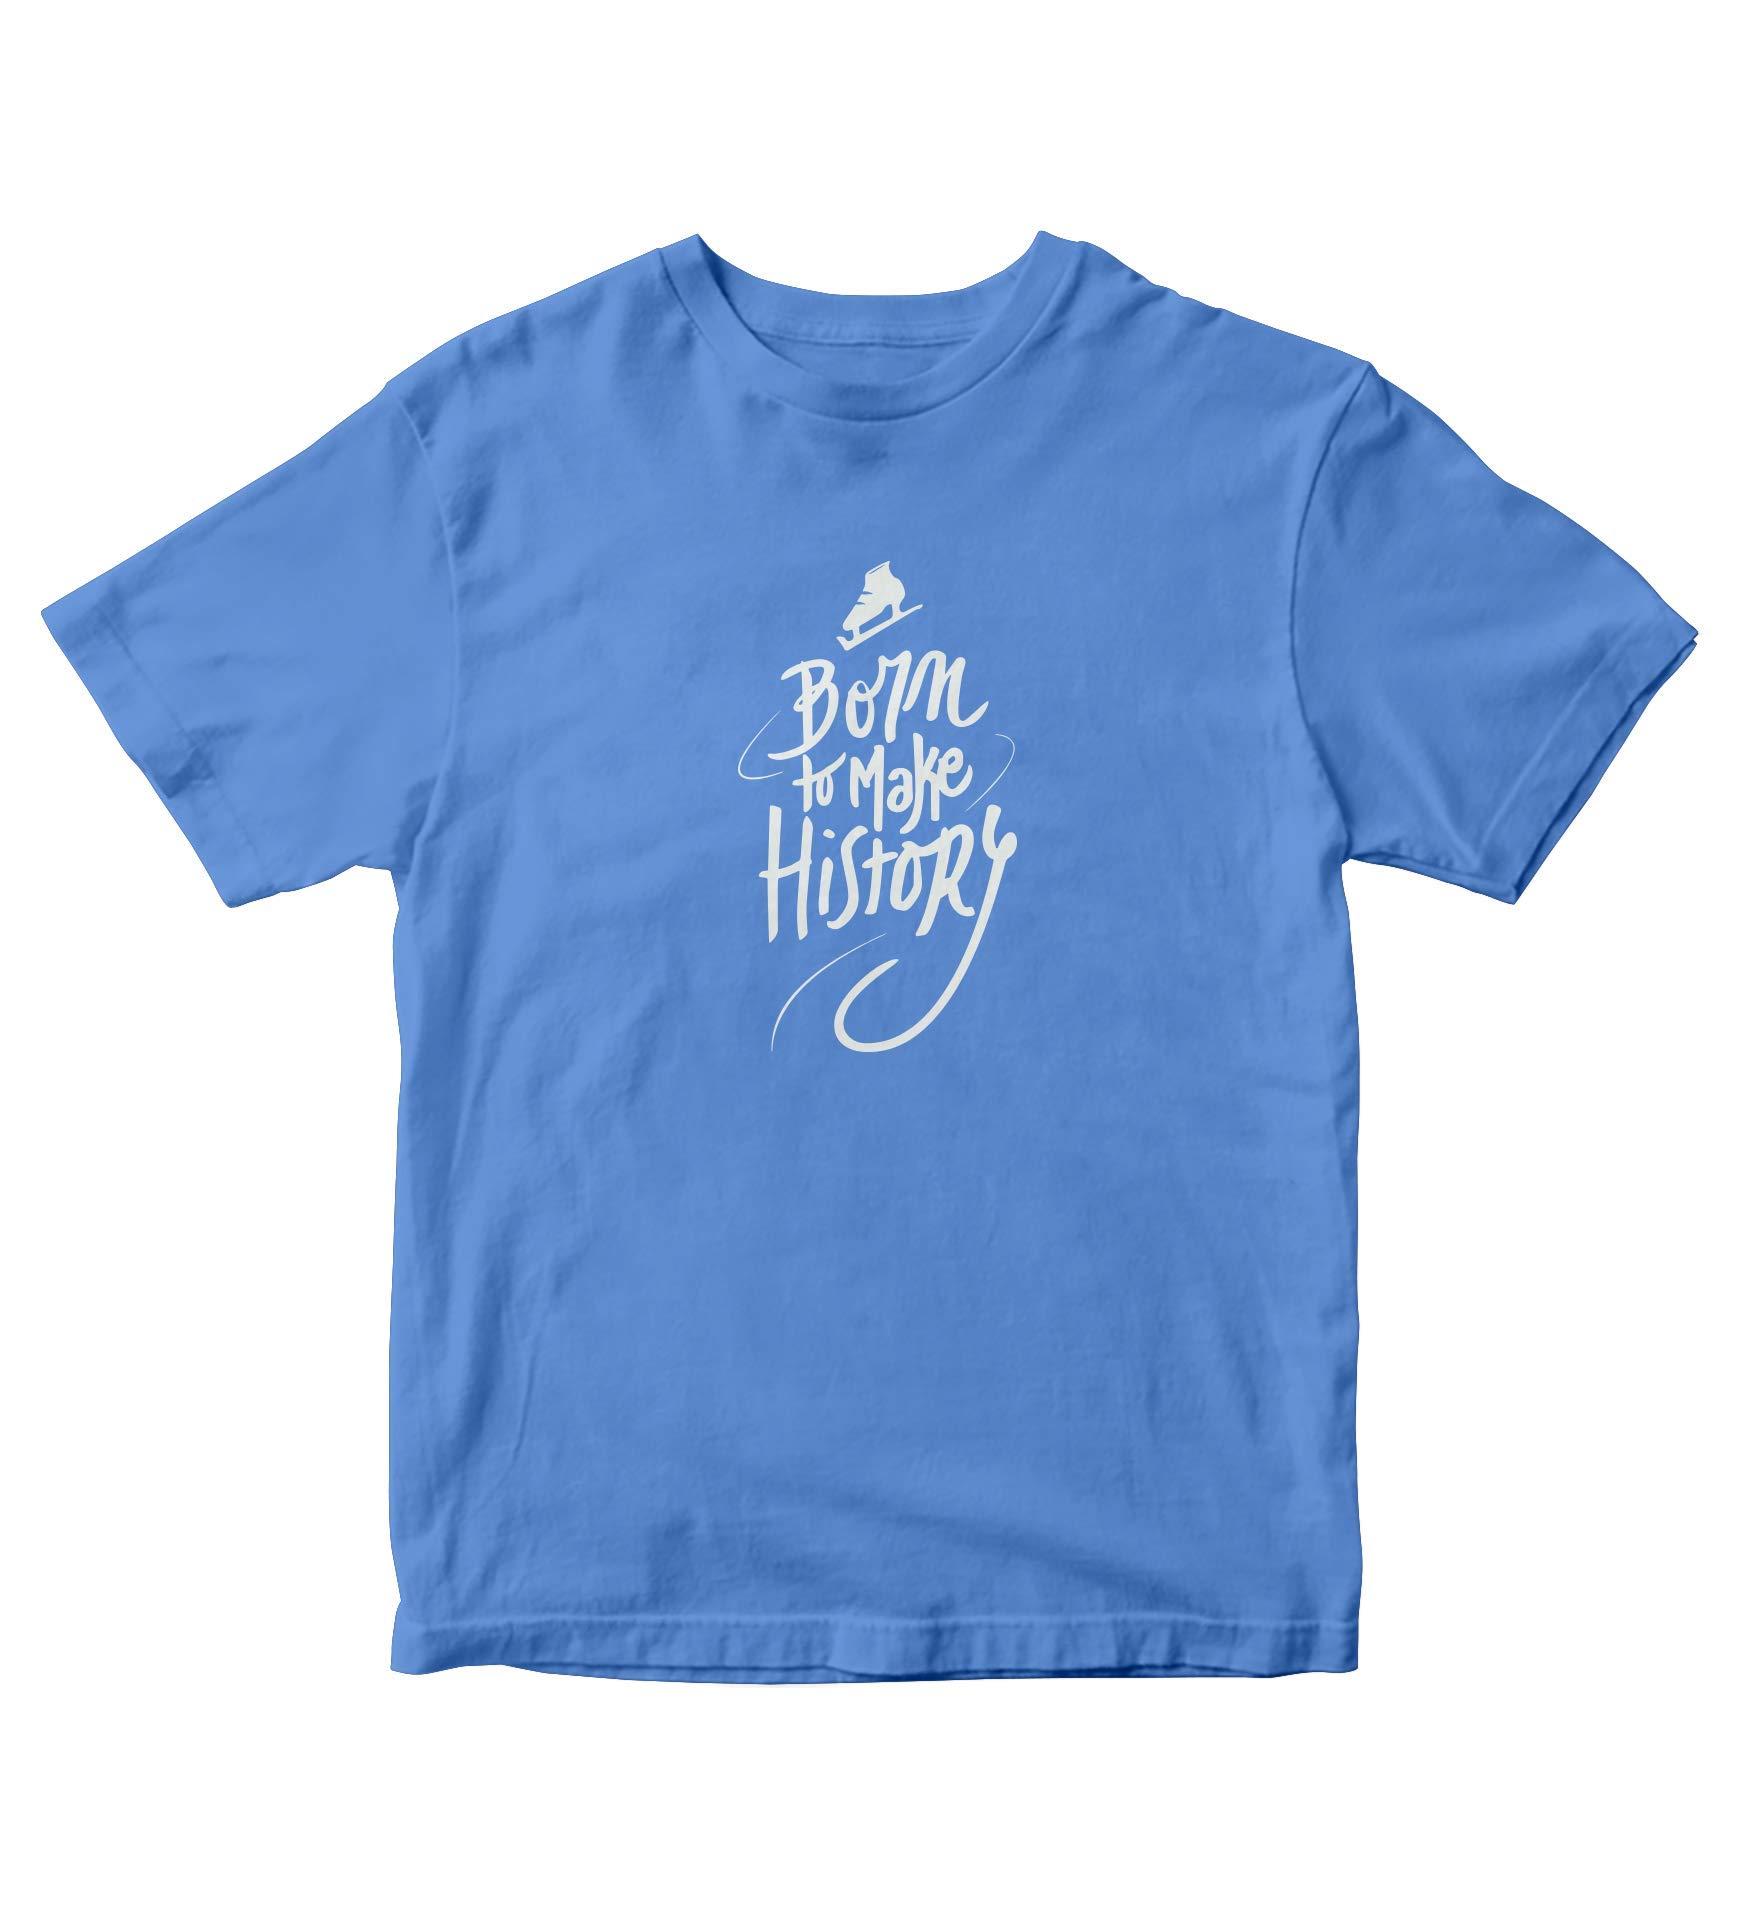 Yuri On Ice Shirt Born To Make History Anime Manga S Light Blue Shirt A787